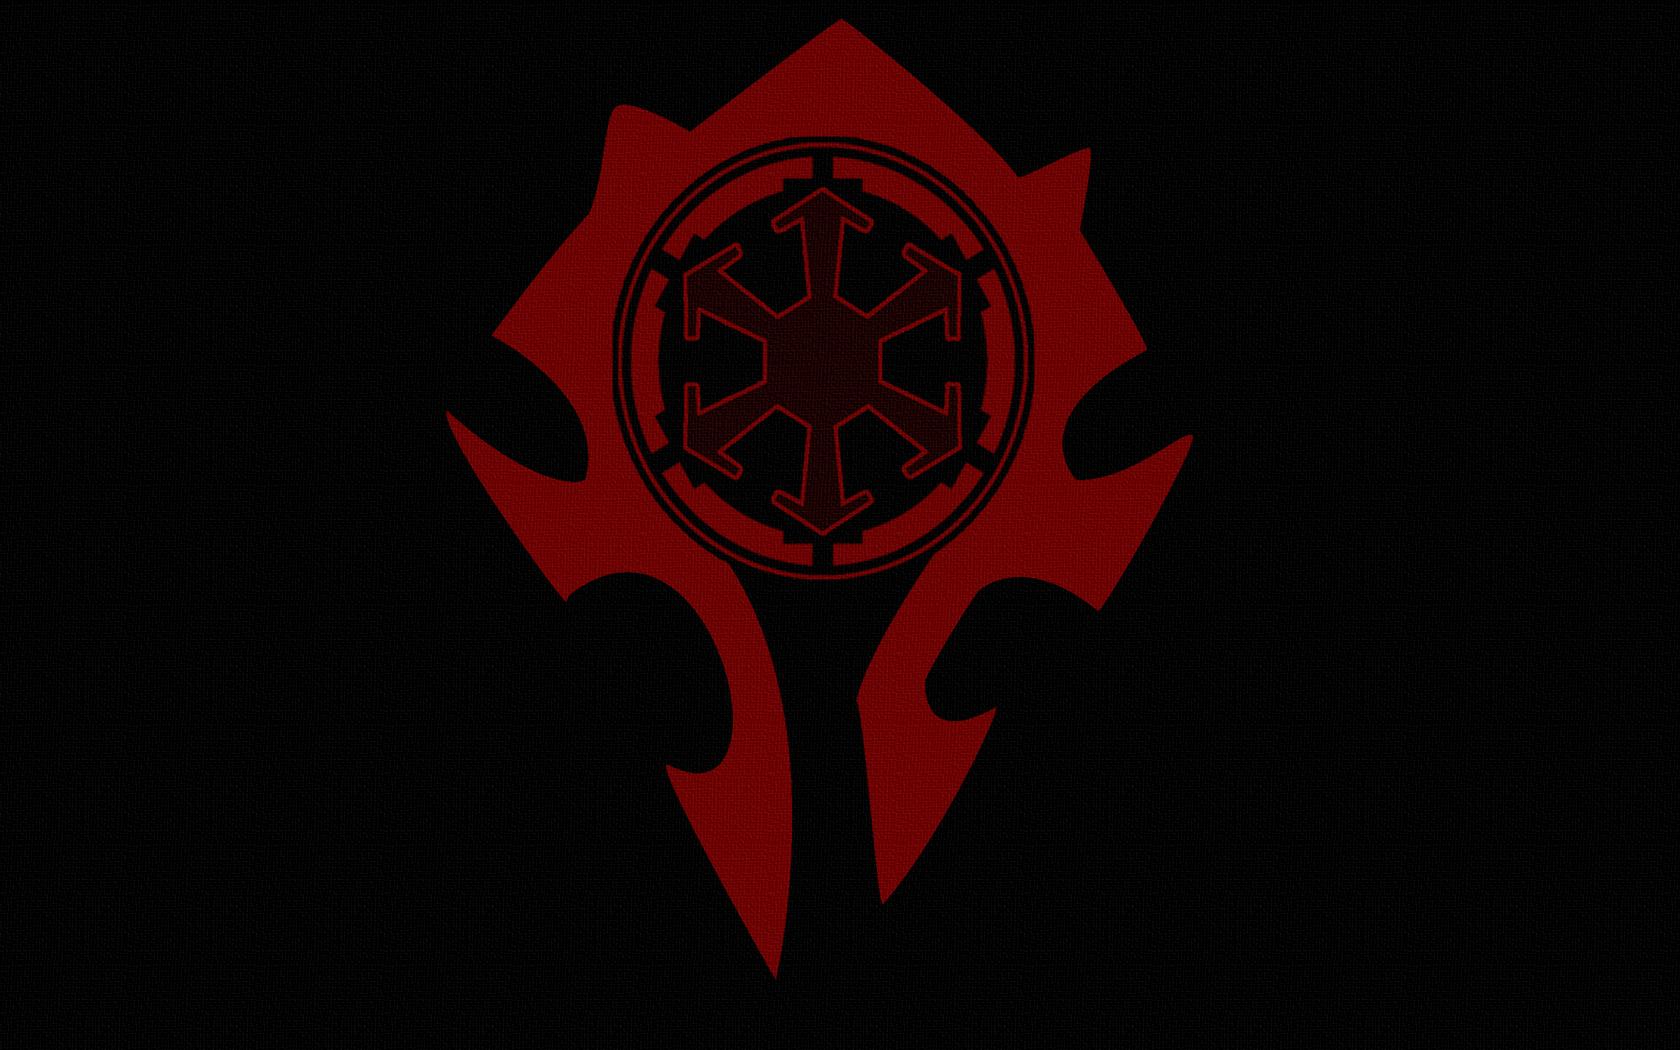 Sith Horde 1 Star Wars World Of WarCraft Wallp by JaxxTraxx on 1680x1050